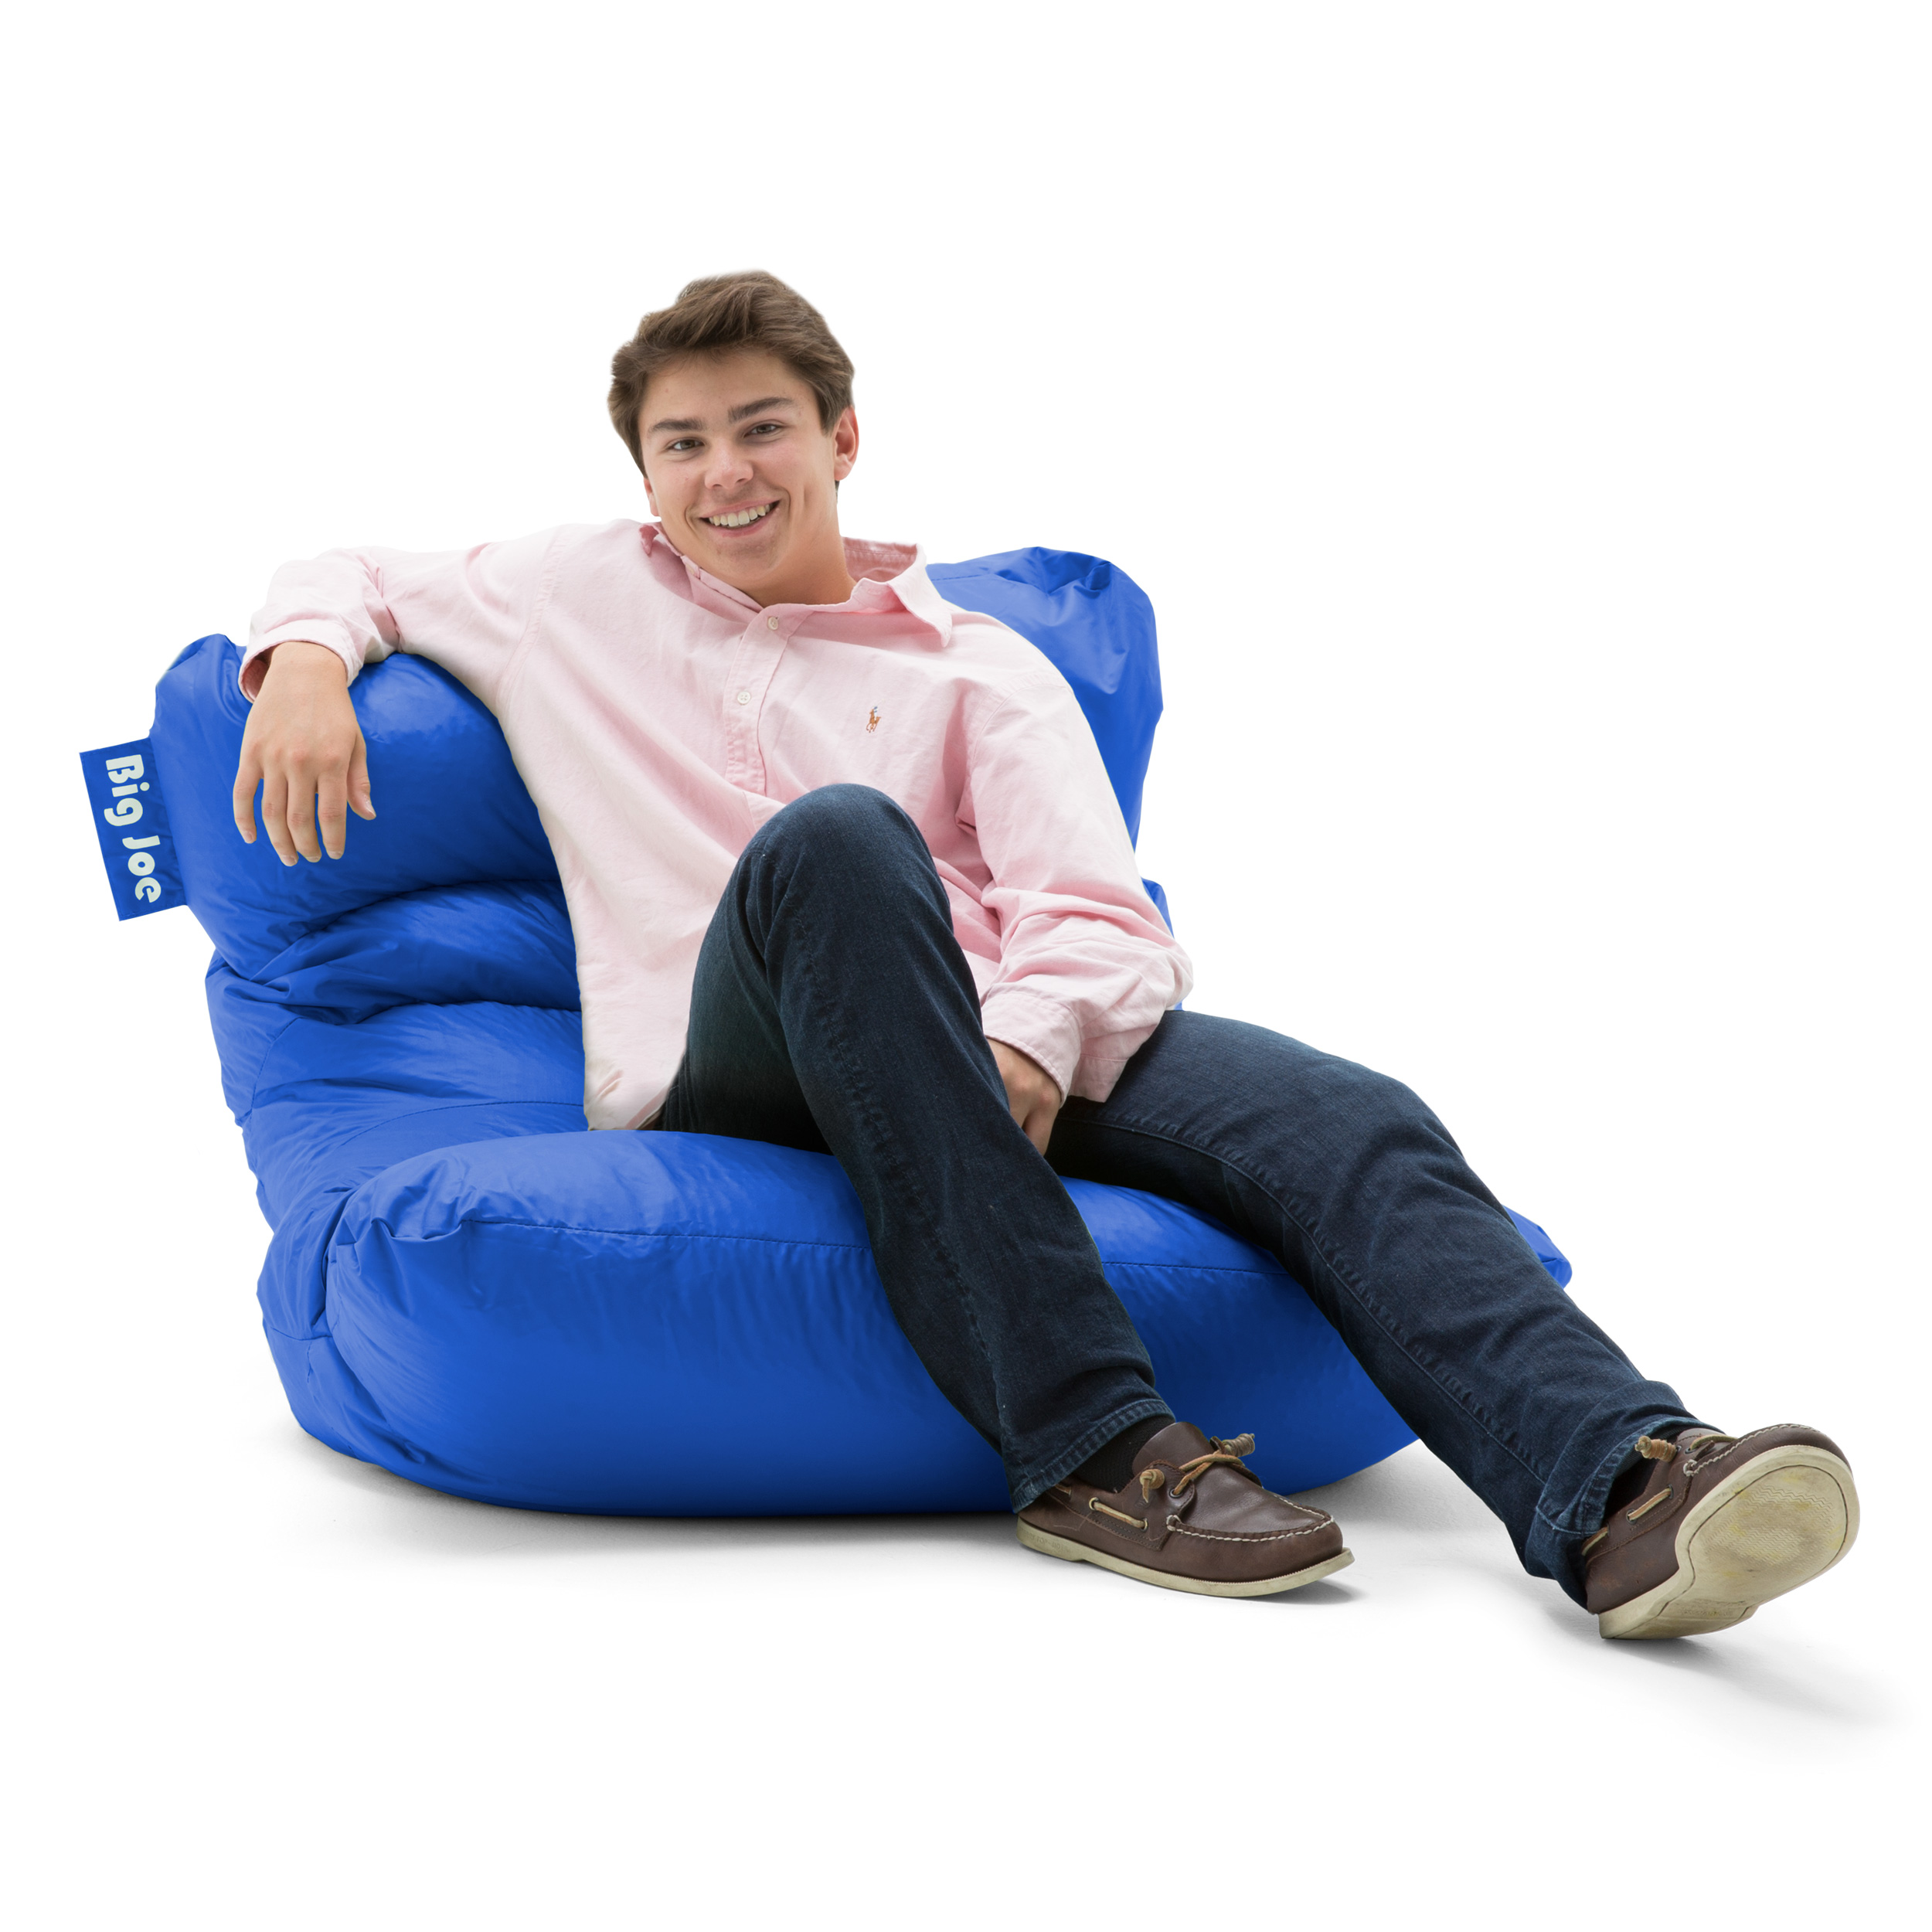 Superb Big Joe Roma Floor Bean Bag Chair Multiple Colors Fabrics Beatyapartments Chair Design Images Beatyapartmentscom